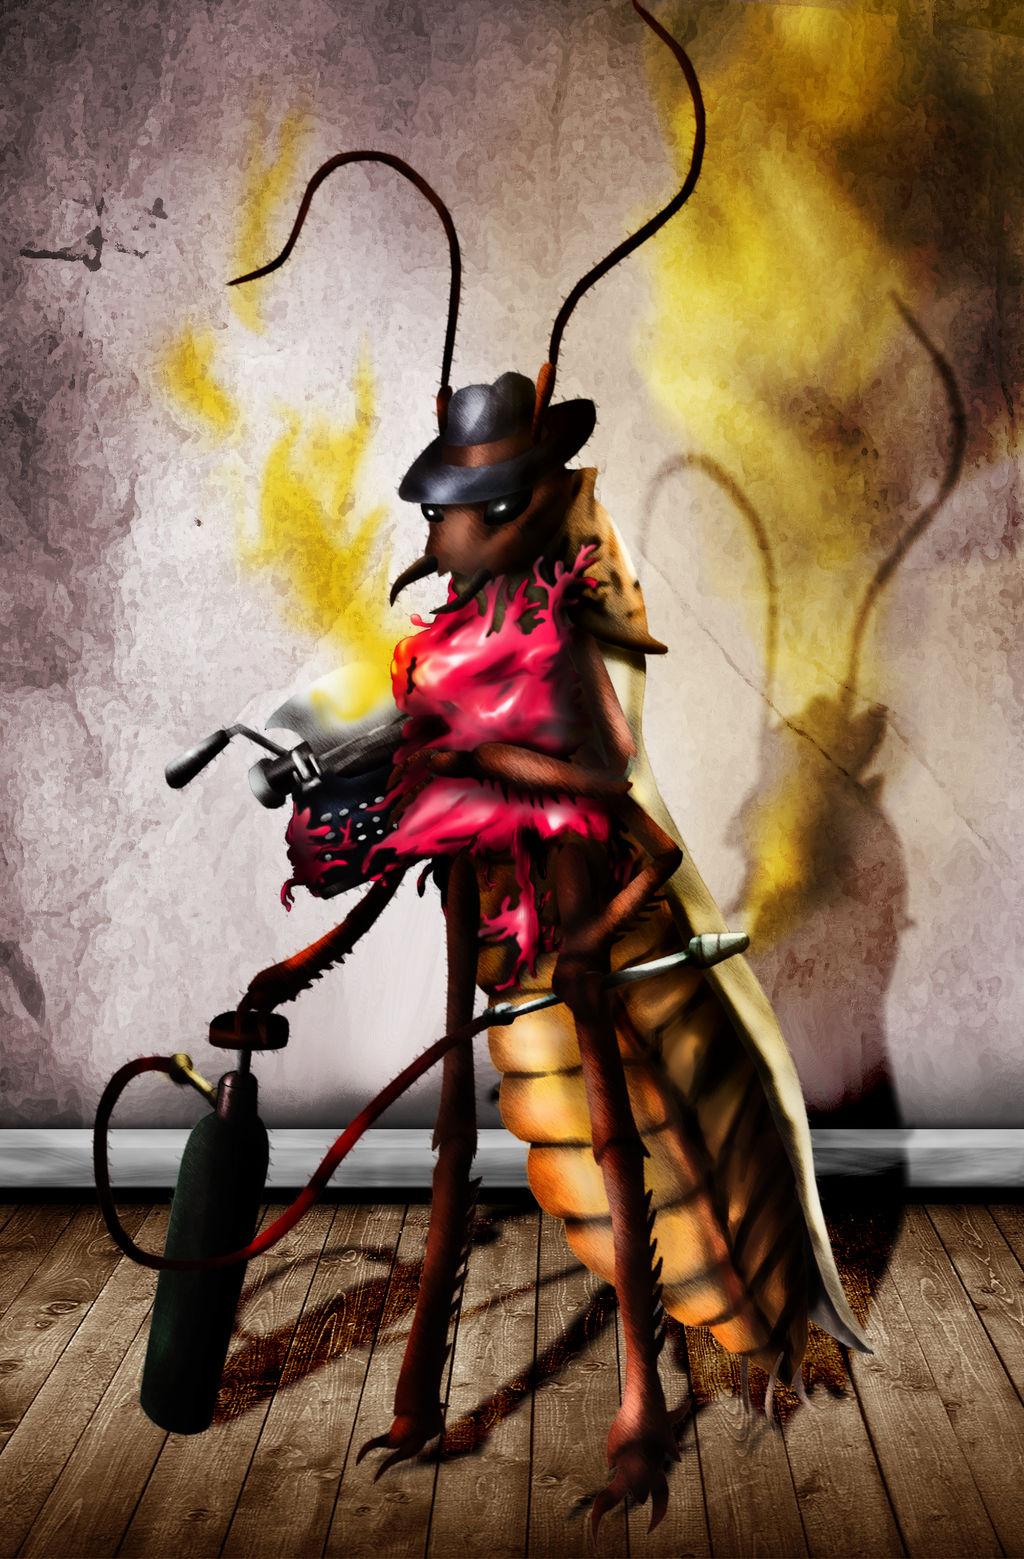 Dirty Roach